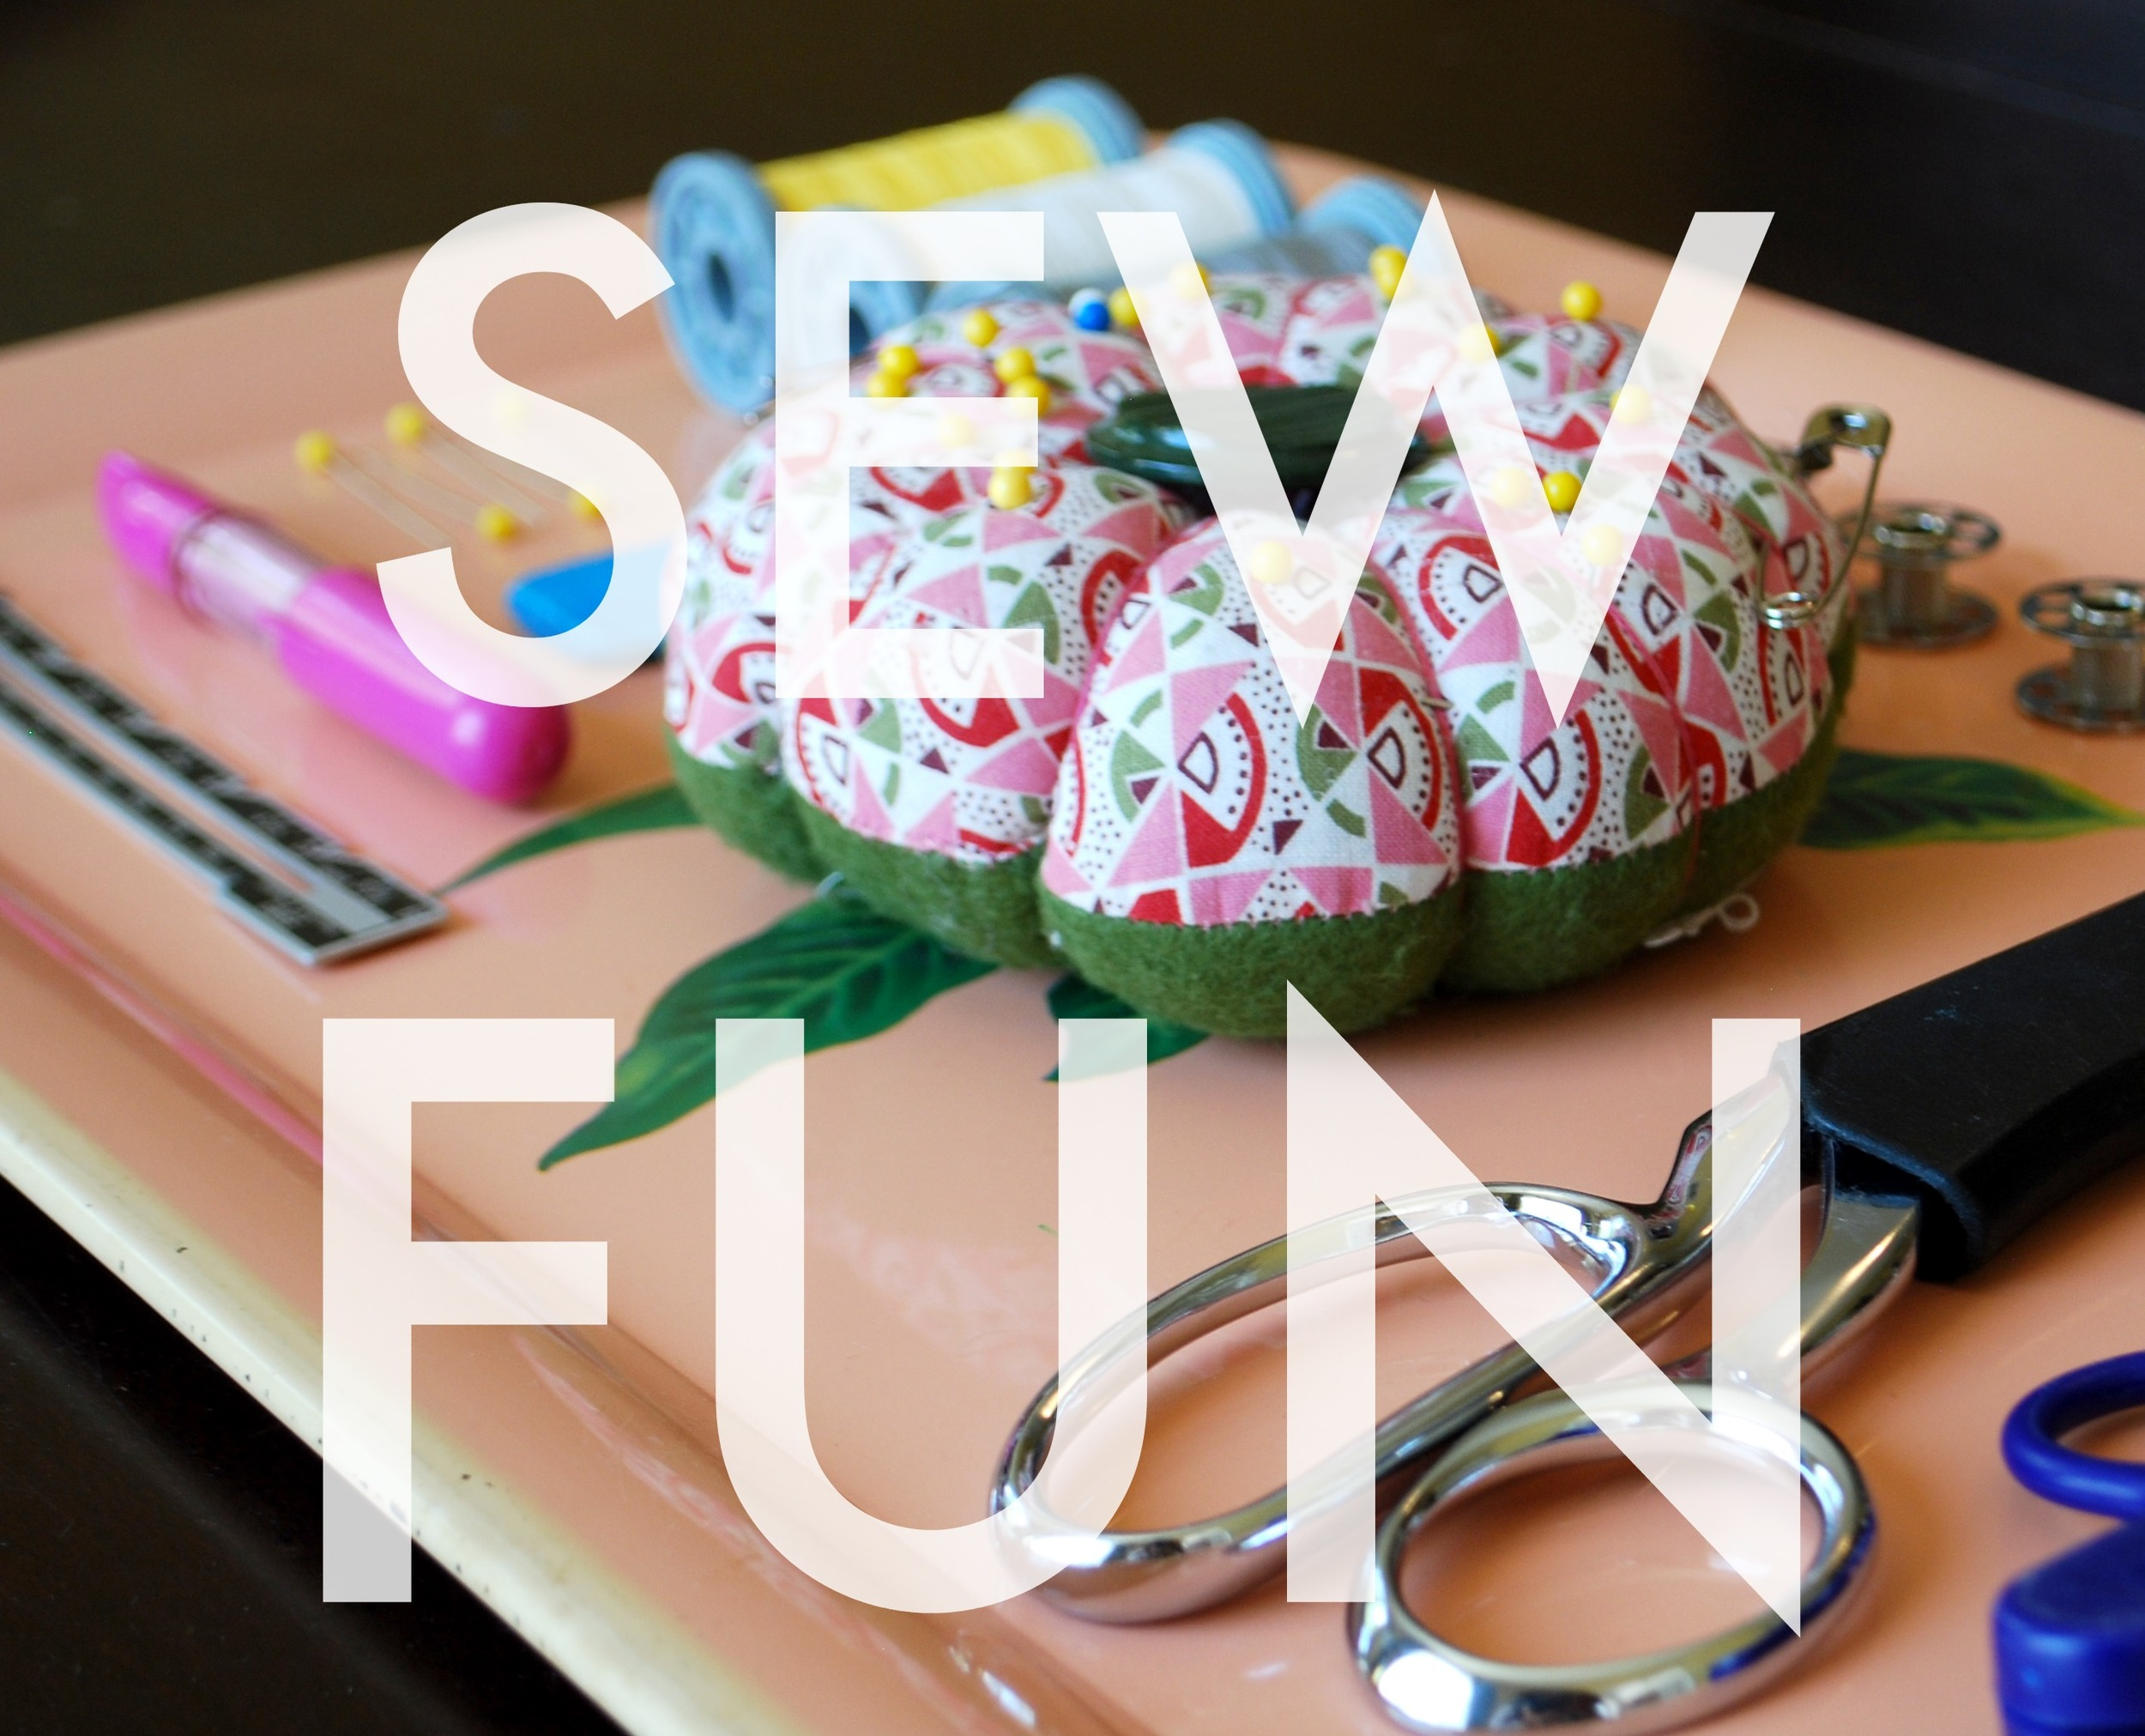 Sew Fun Workshop for Kids   Sew You Studio.com